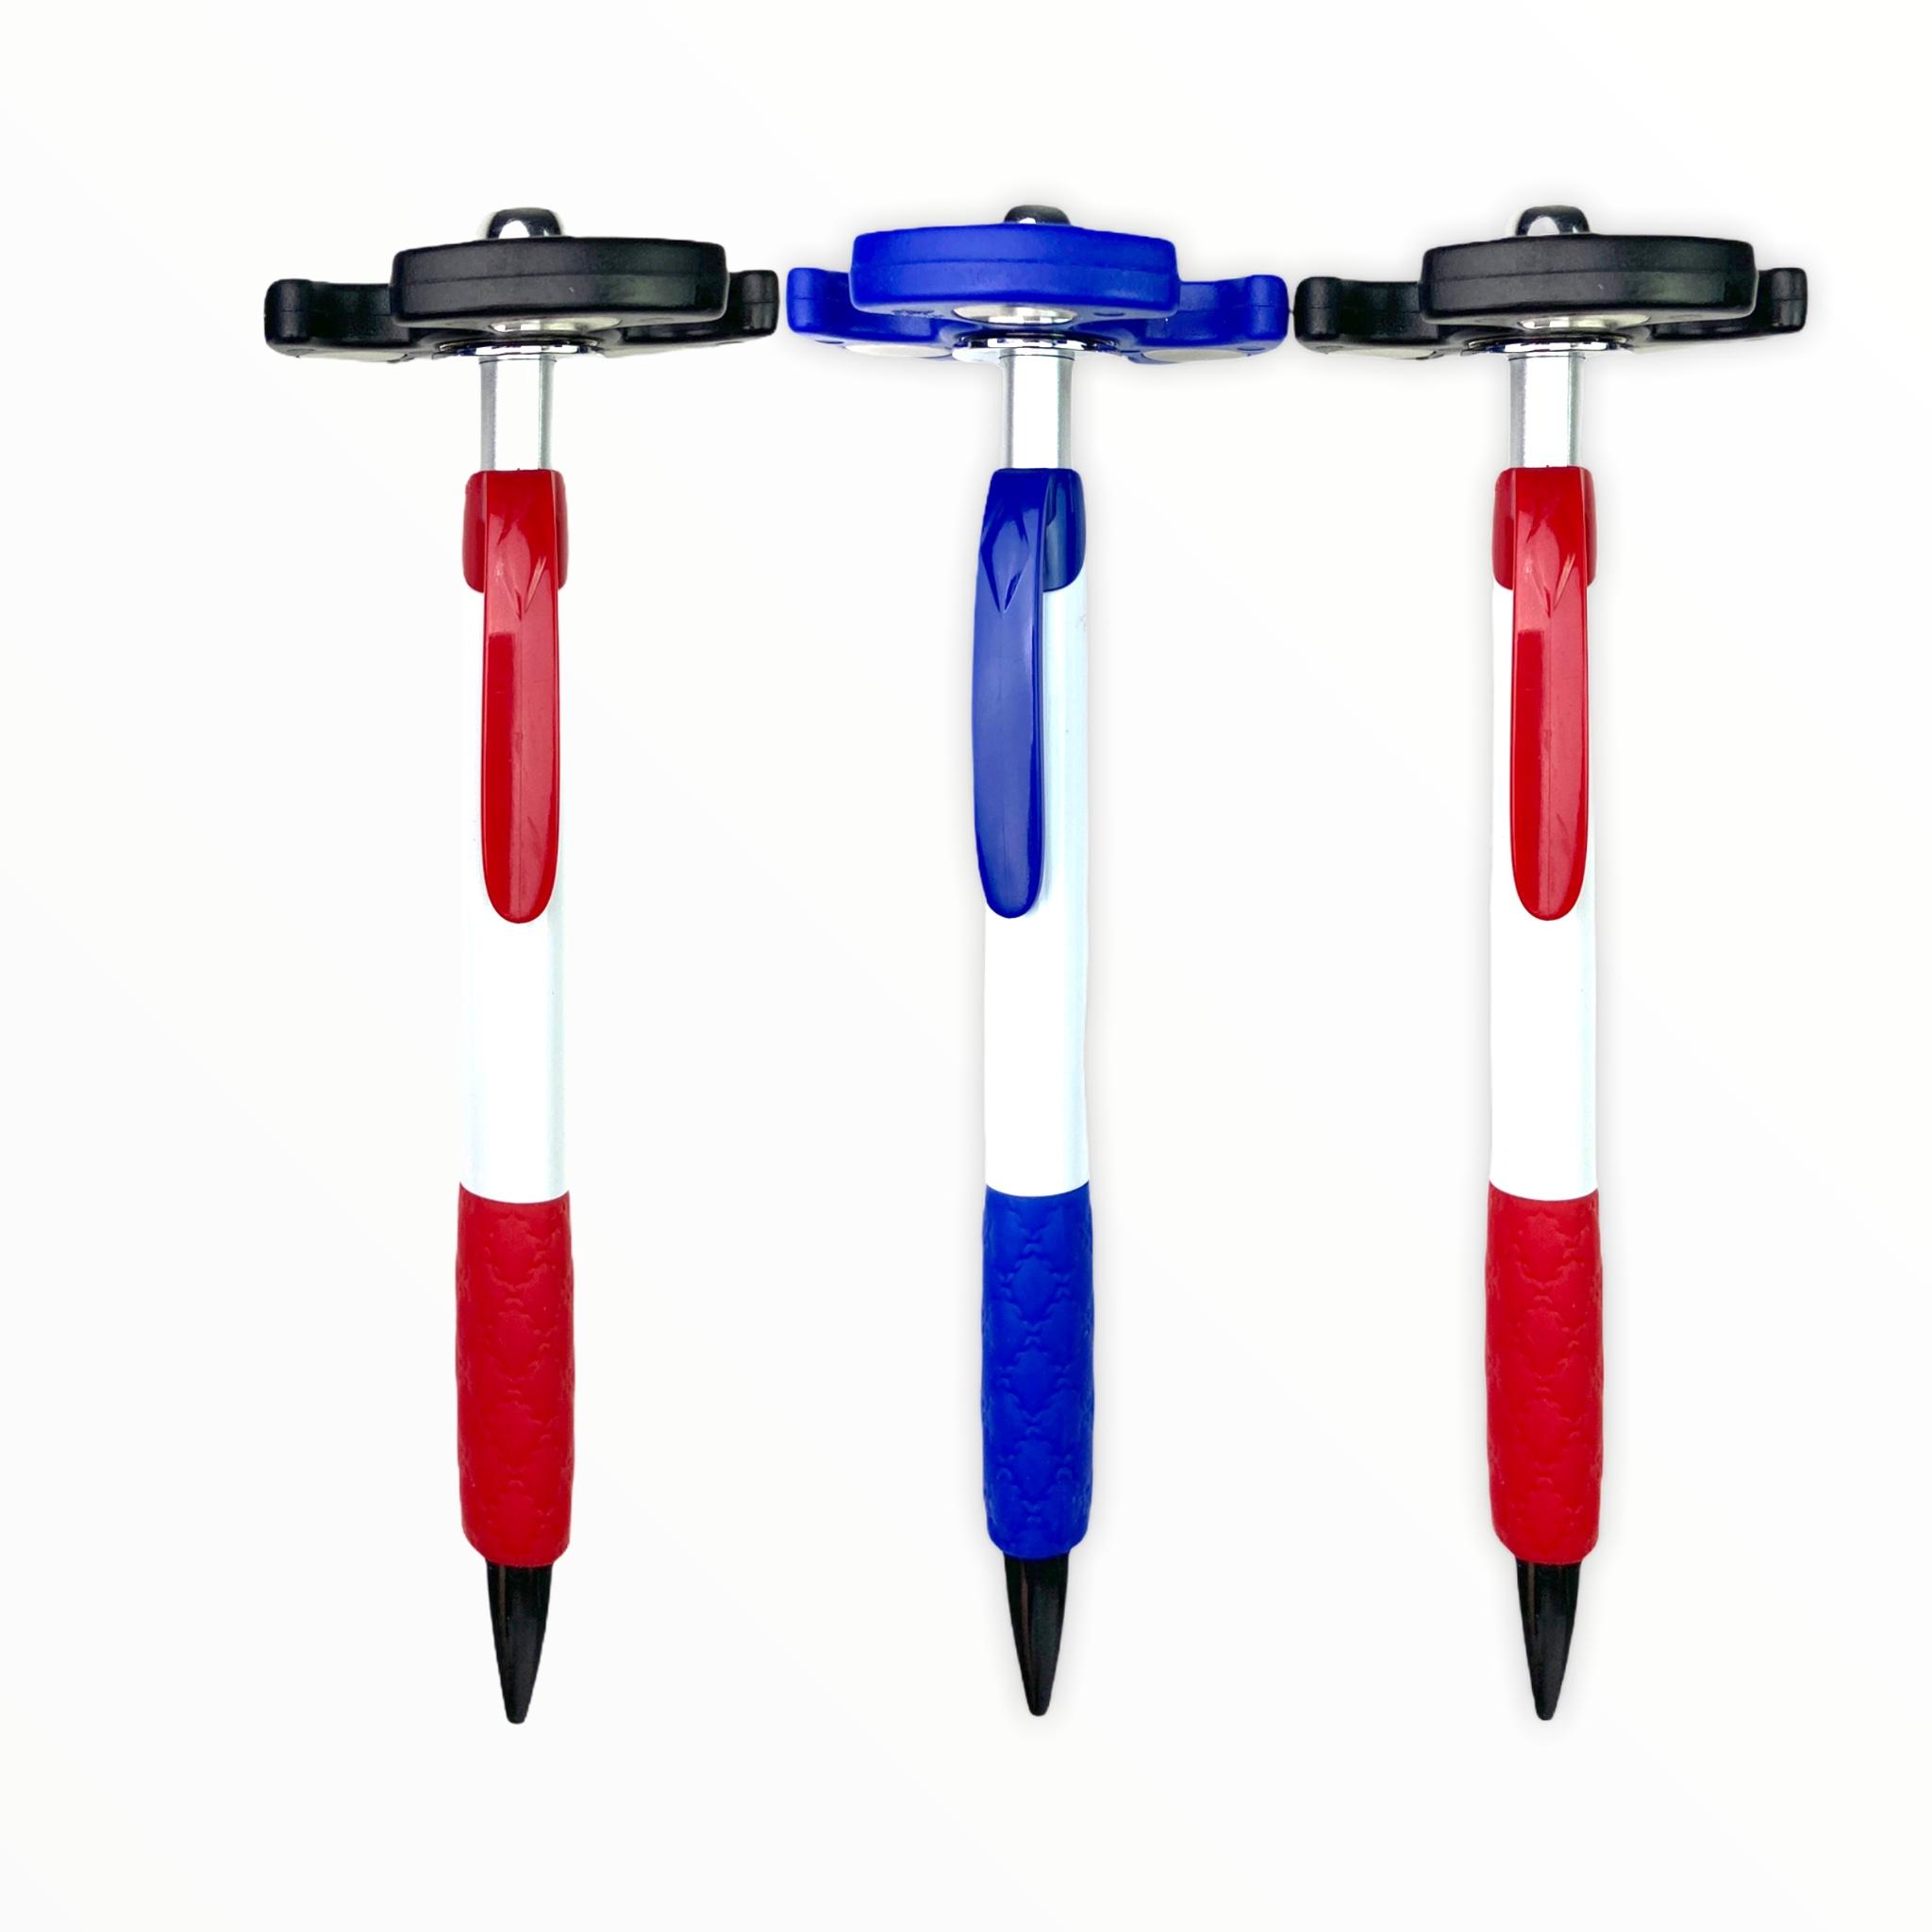 3 PACK of Retractable Spinner Pens $4.99 (reg $12)